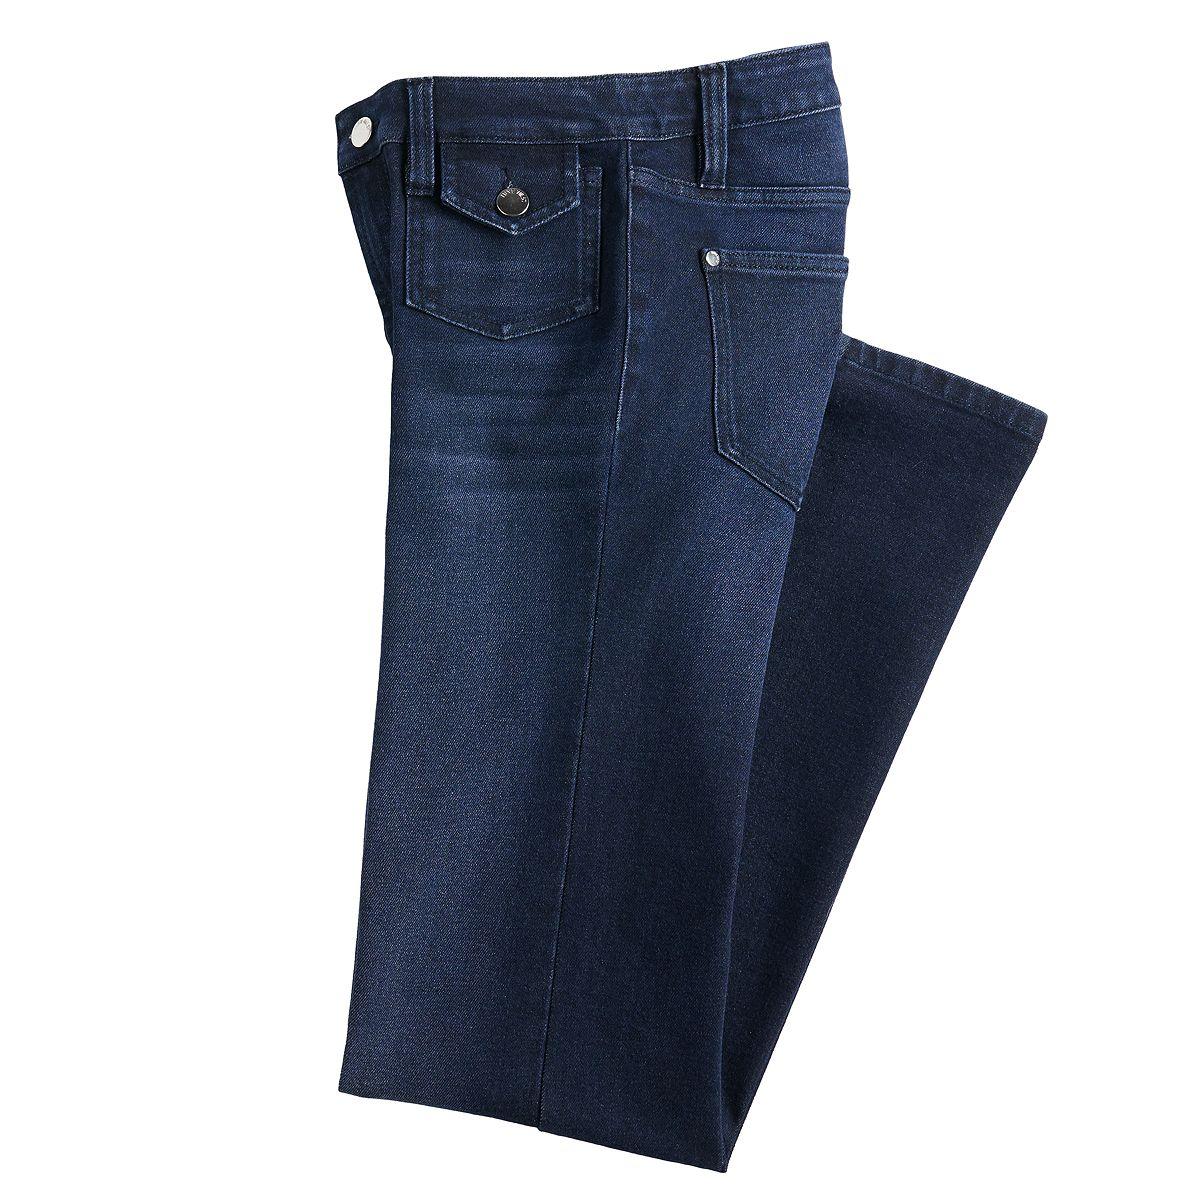 Women's Nine West High Rise Flare Jeans Black Night Wash U8E9J